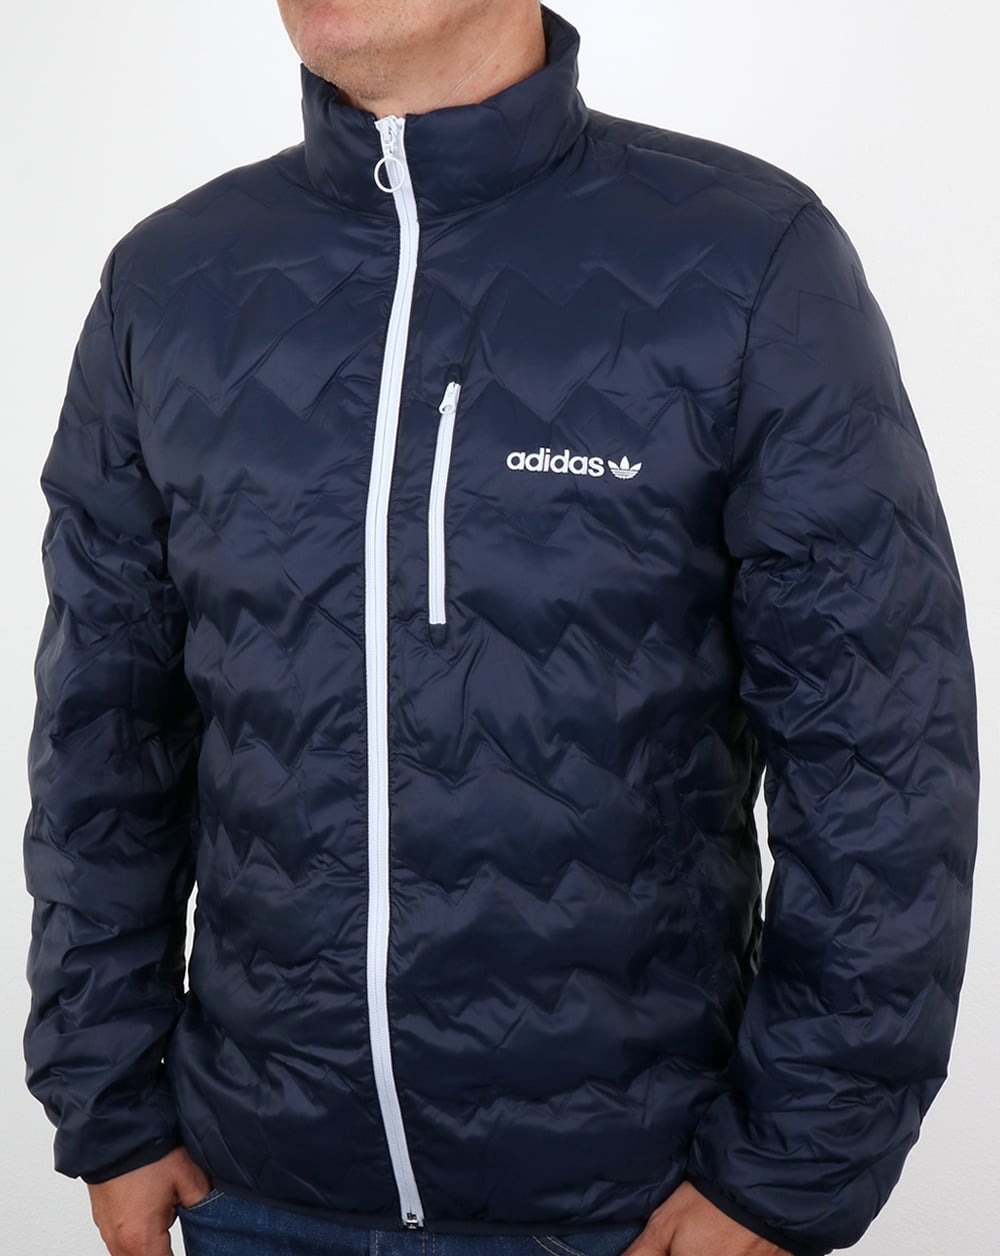 Adidas Originals Serrated Jacket Legend Ink Padded Coat